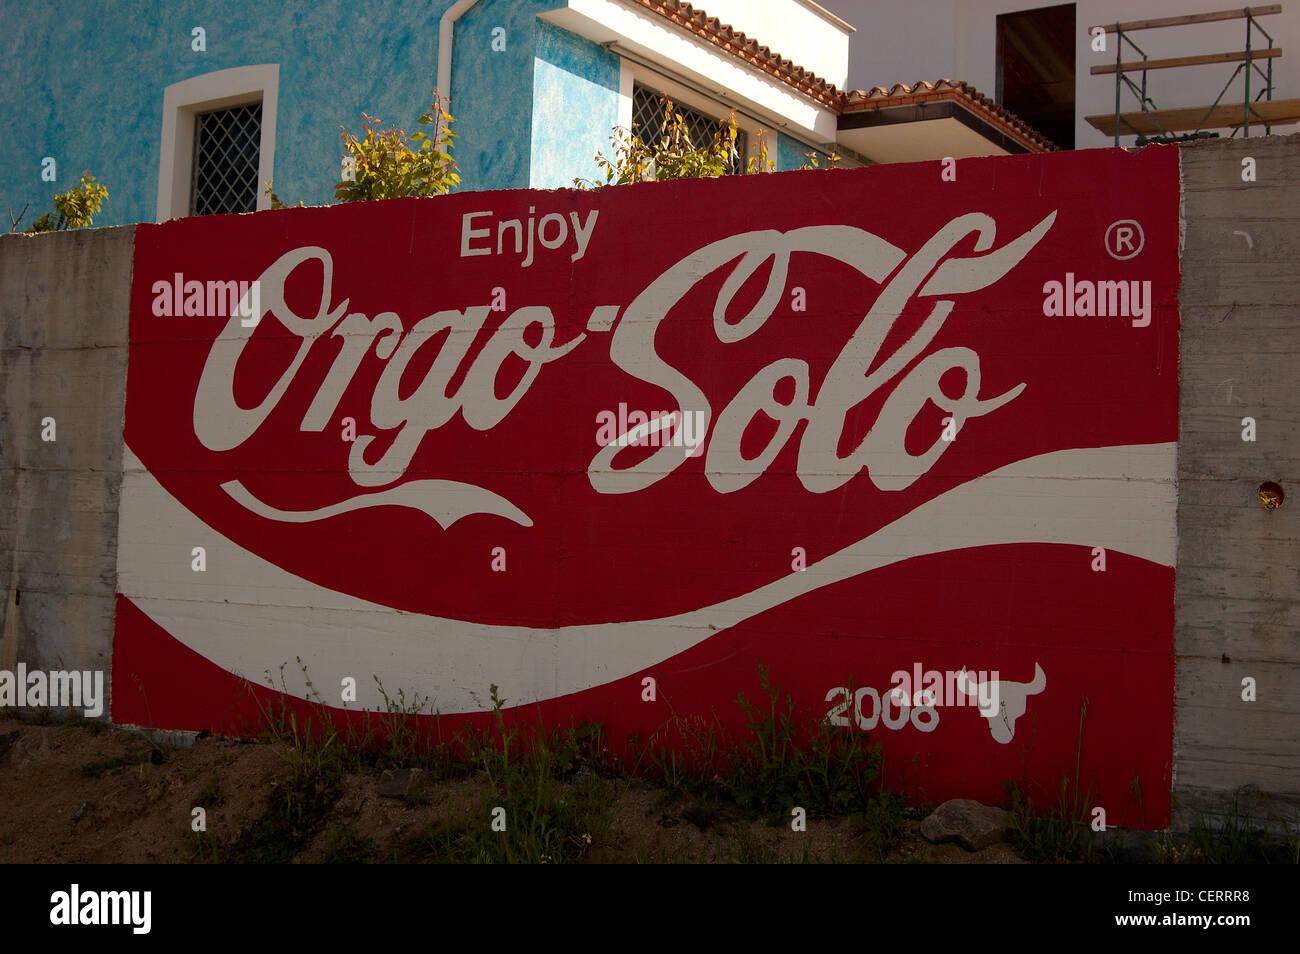 Orgosolo Coca Cola like writing (Sardinia) - Stock Image